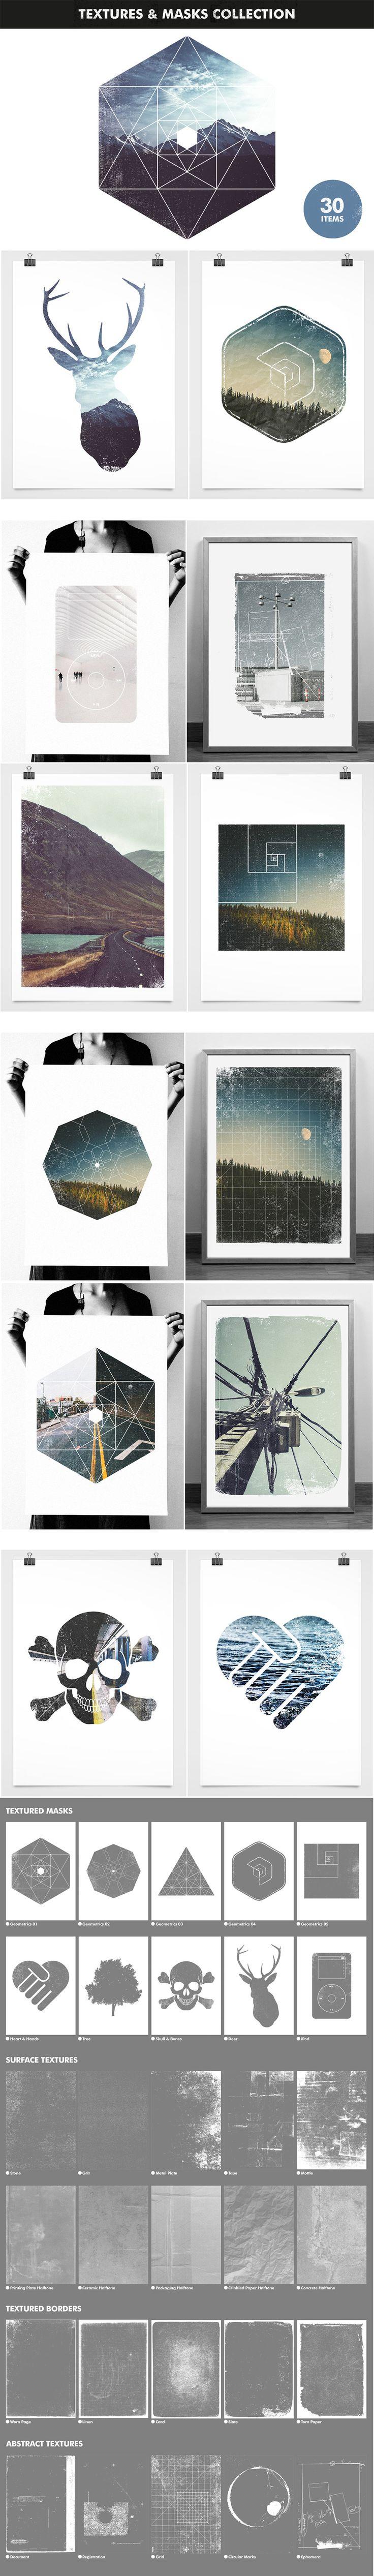 Textures and Image Masks Collection Modern Creative Design Bundle